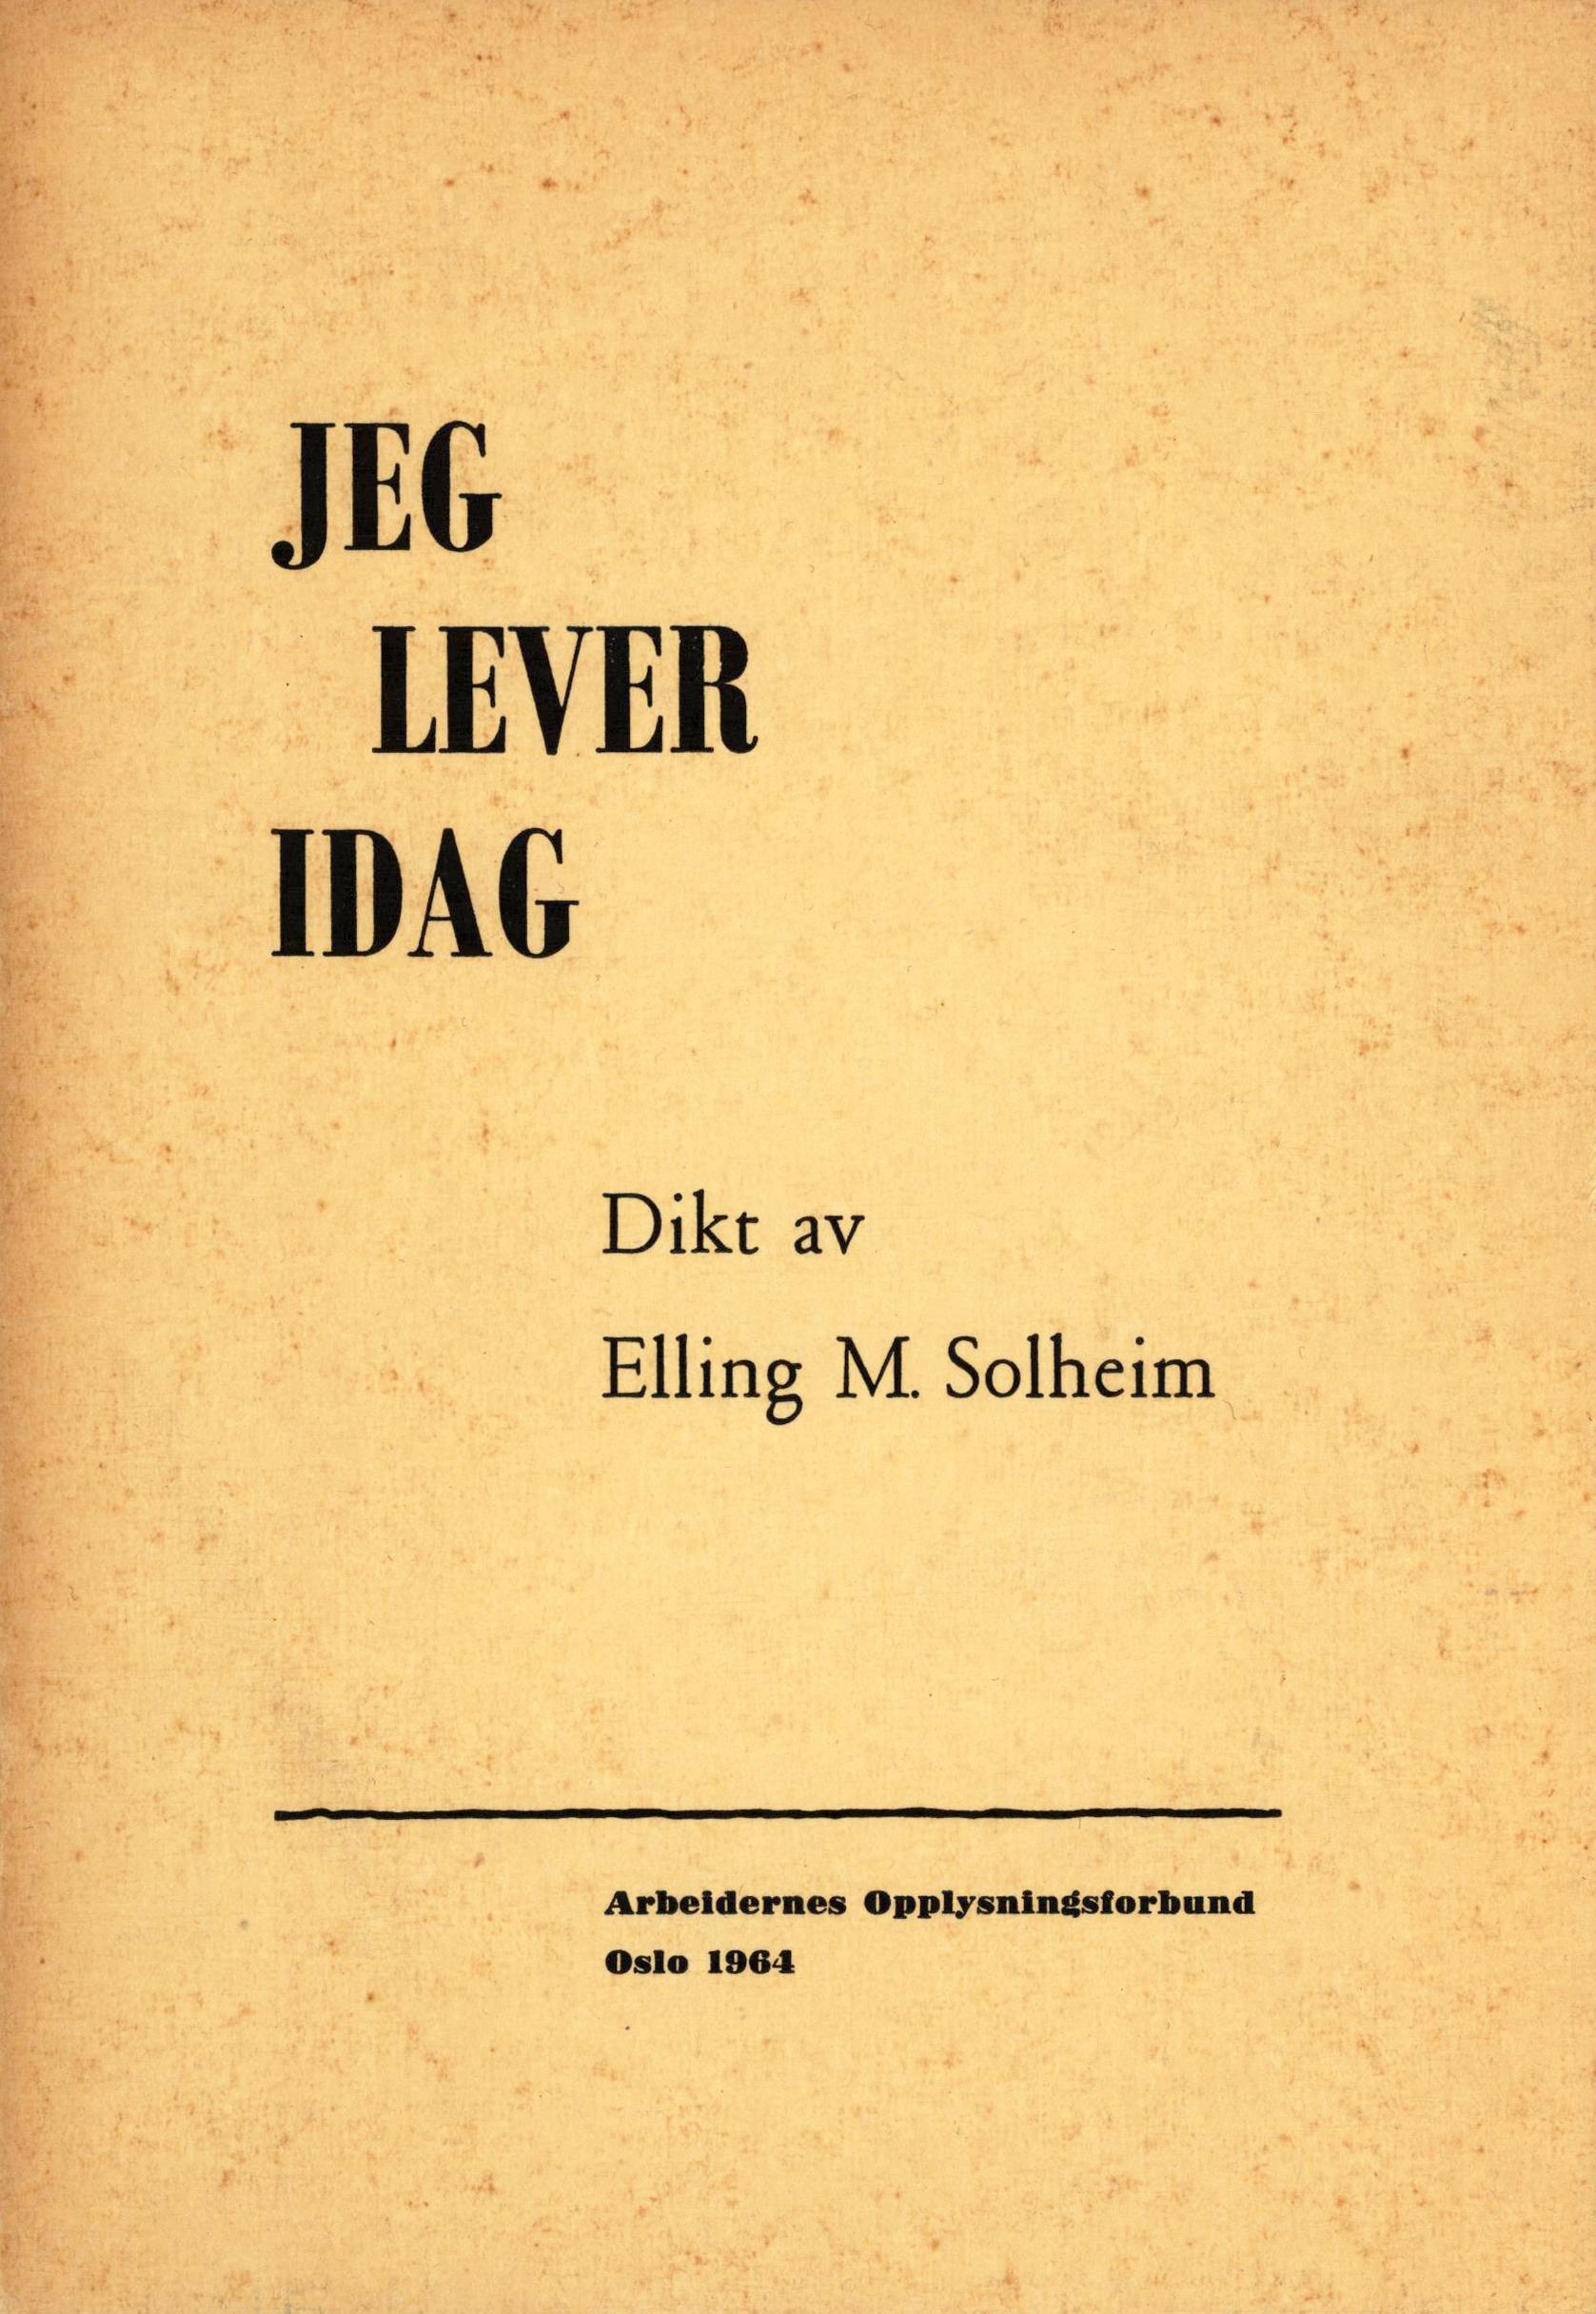 Elling M. Solheim: Jeg lever idag - Dikt